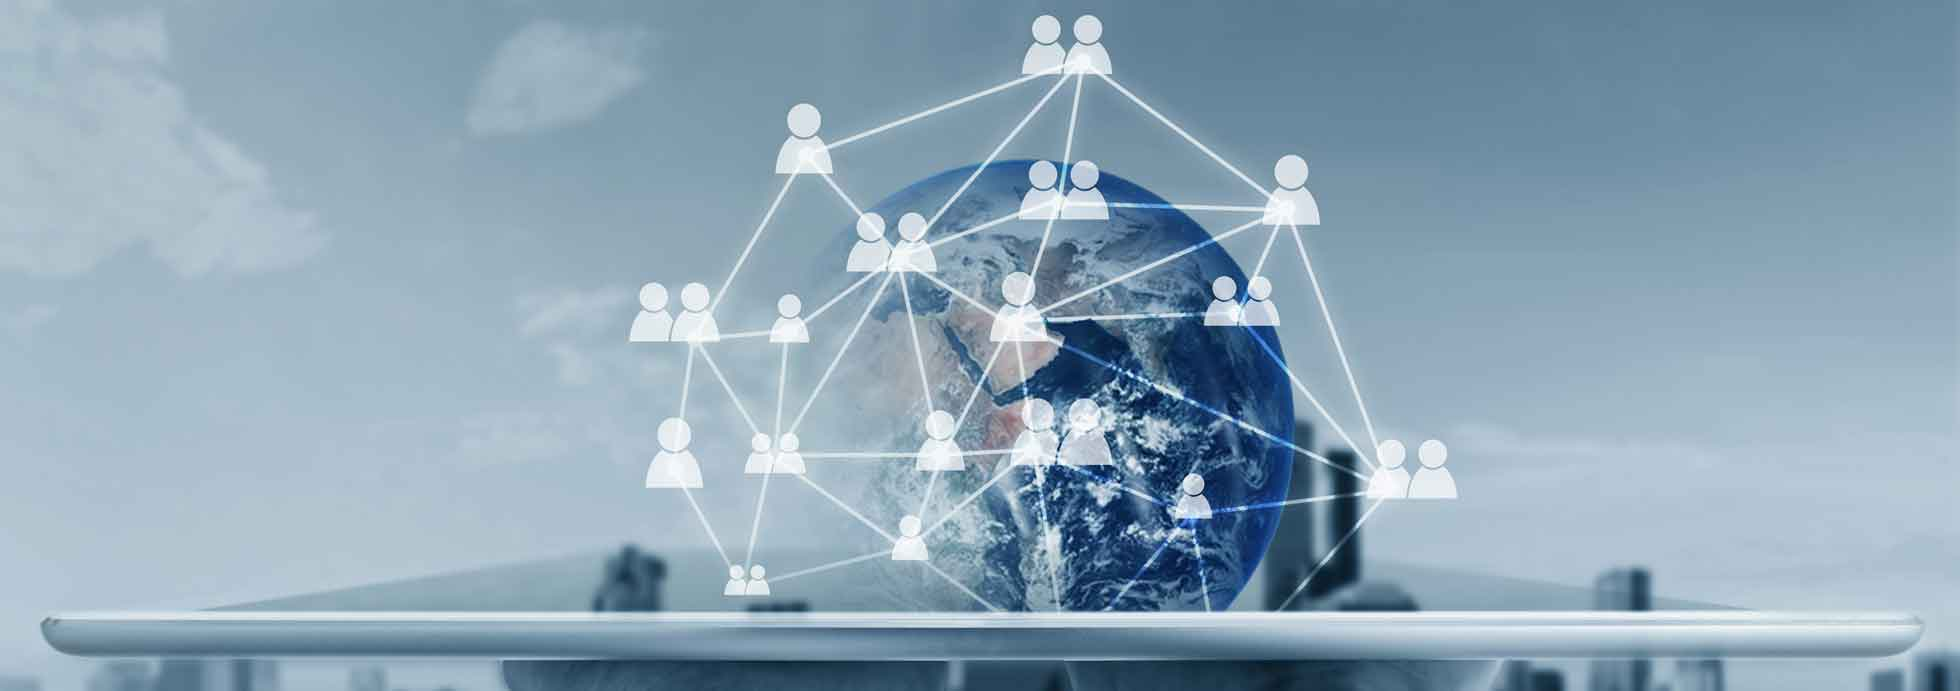 International connection image